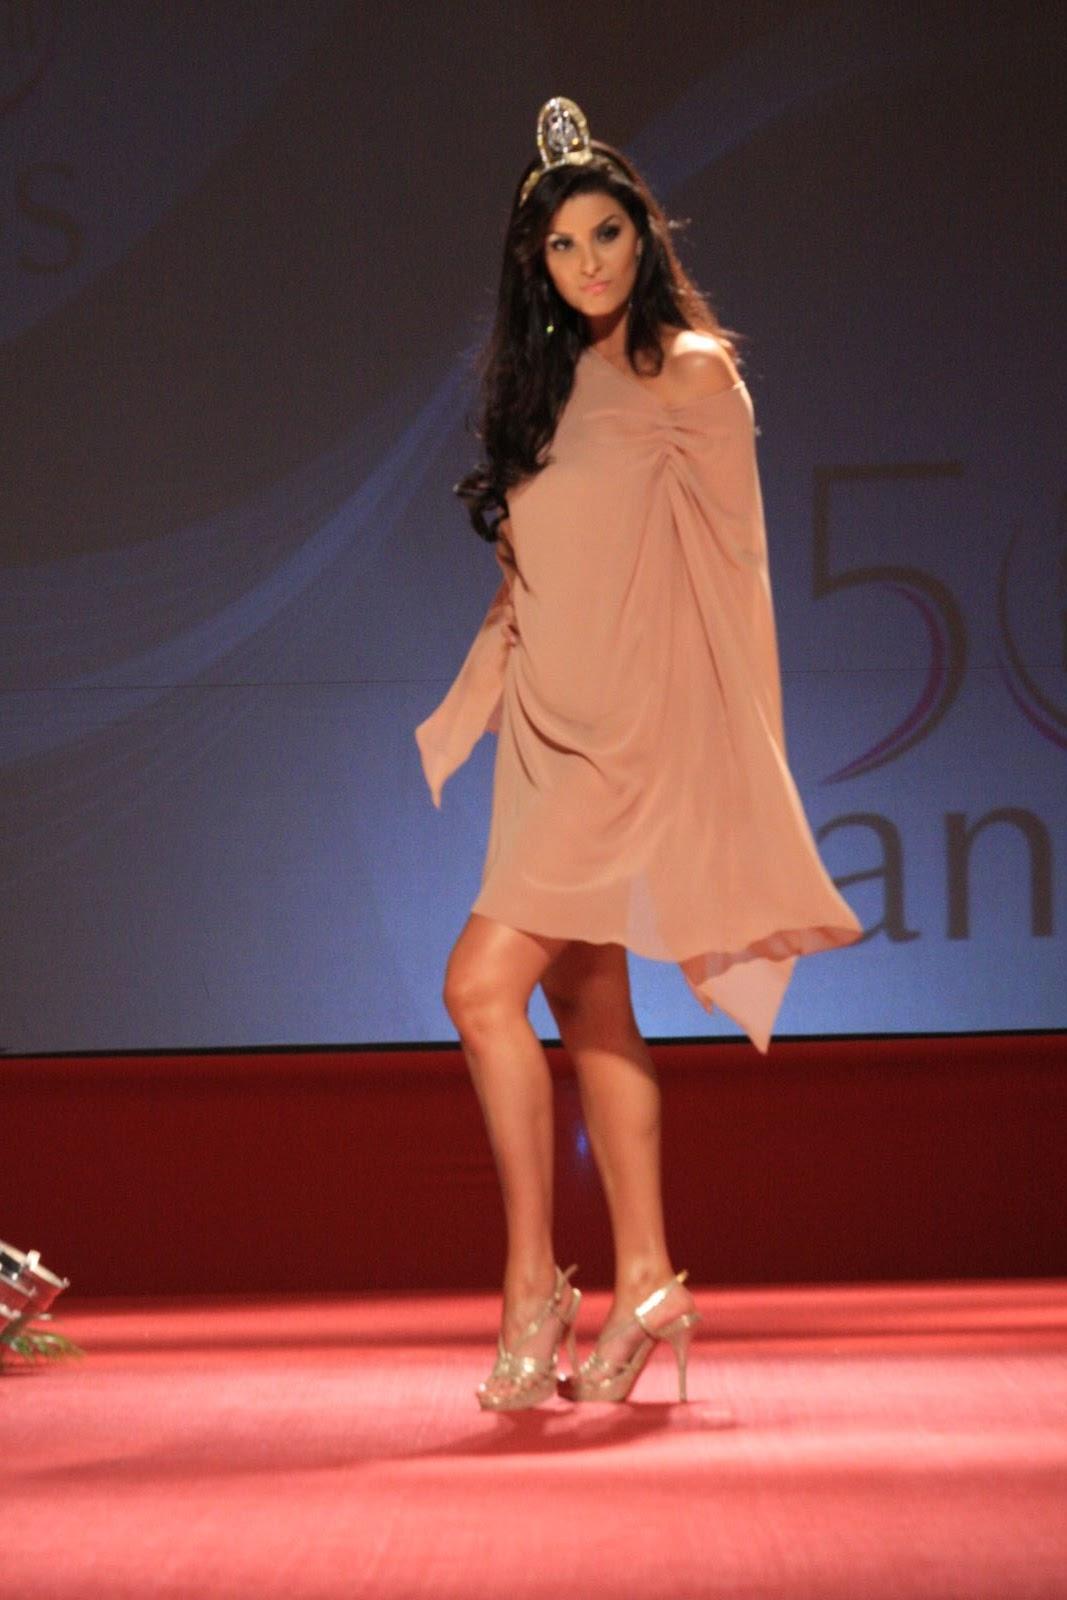 vivian noronha, rainha hispanoamericana 2008. suplente. - Página 2 L9ze8bwn